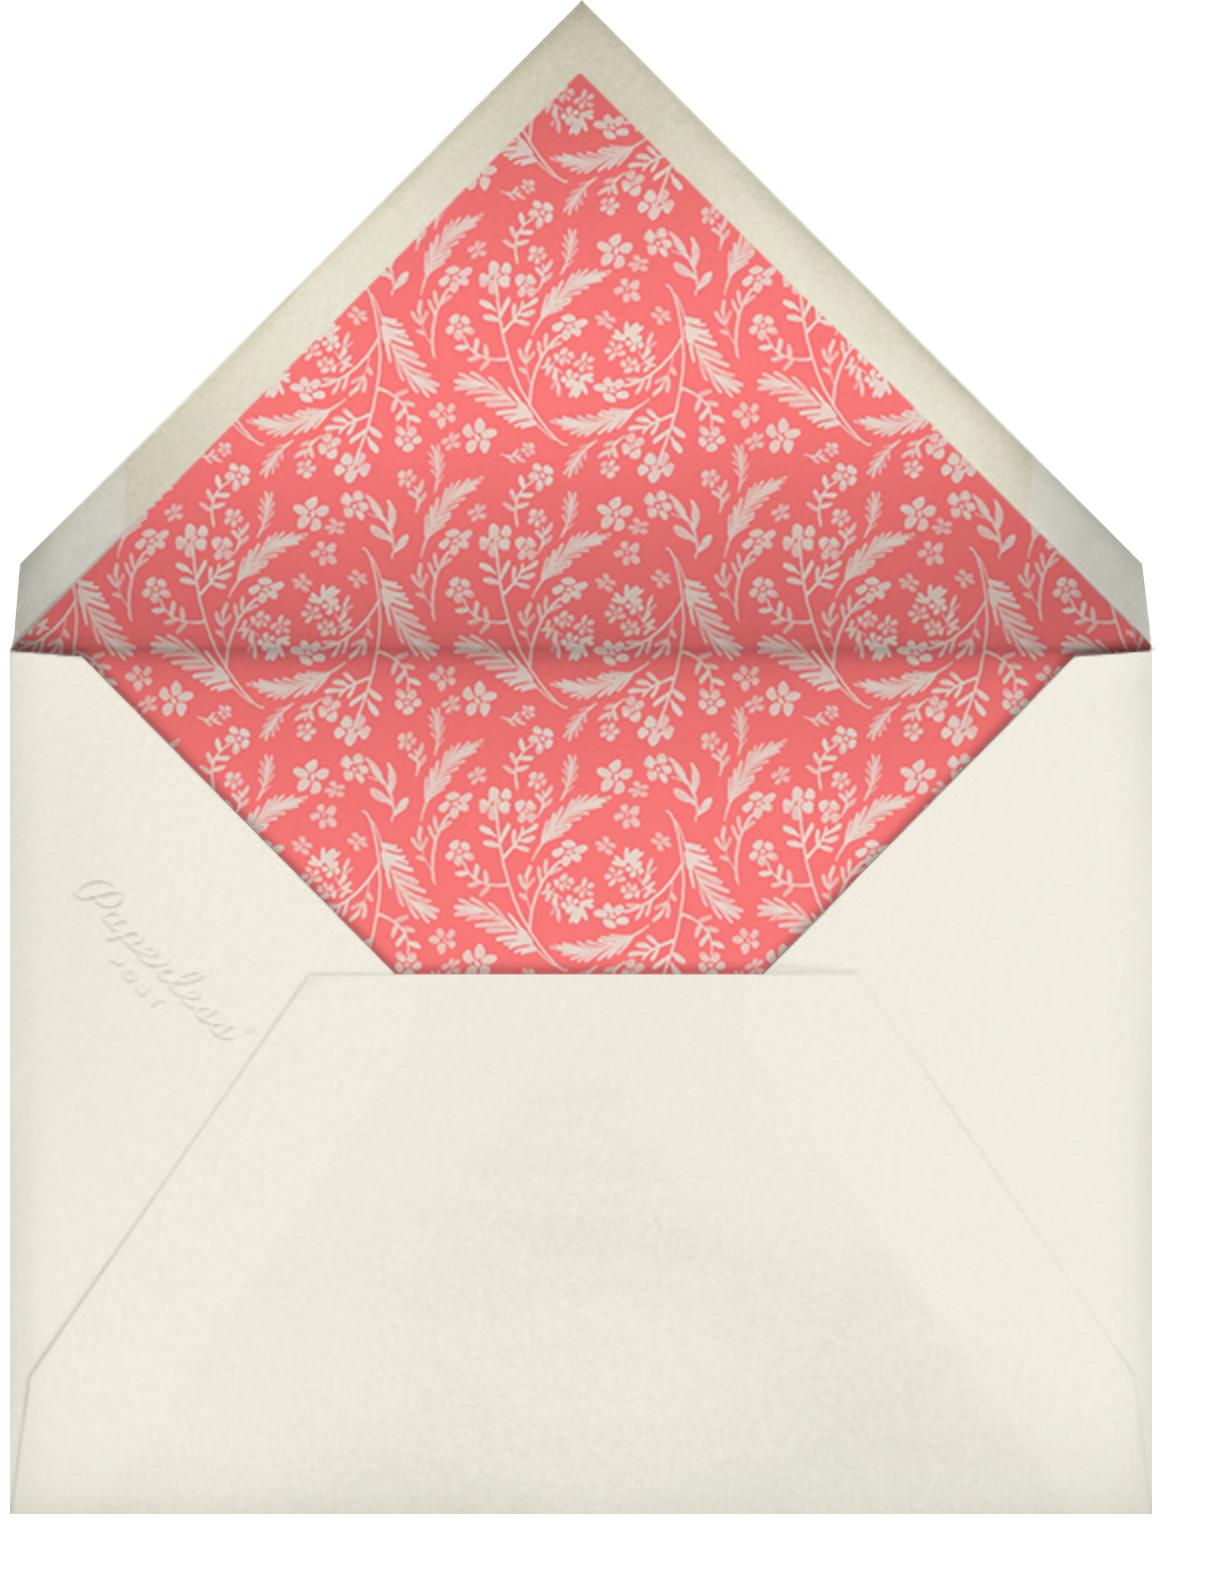 Chic Florette (Photo Invitation) - Crate & Barrel - All - envelope back